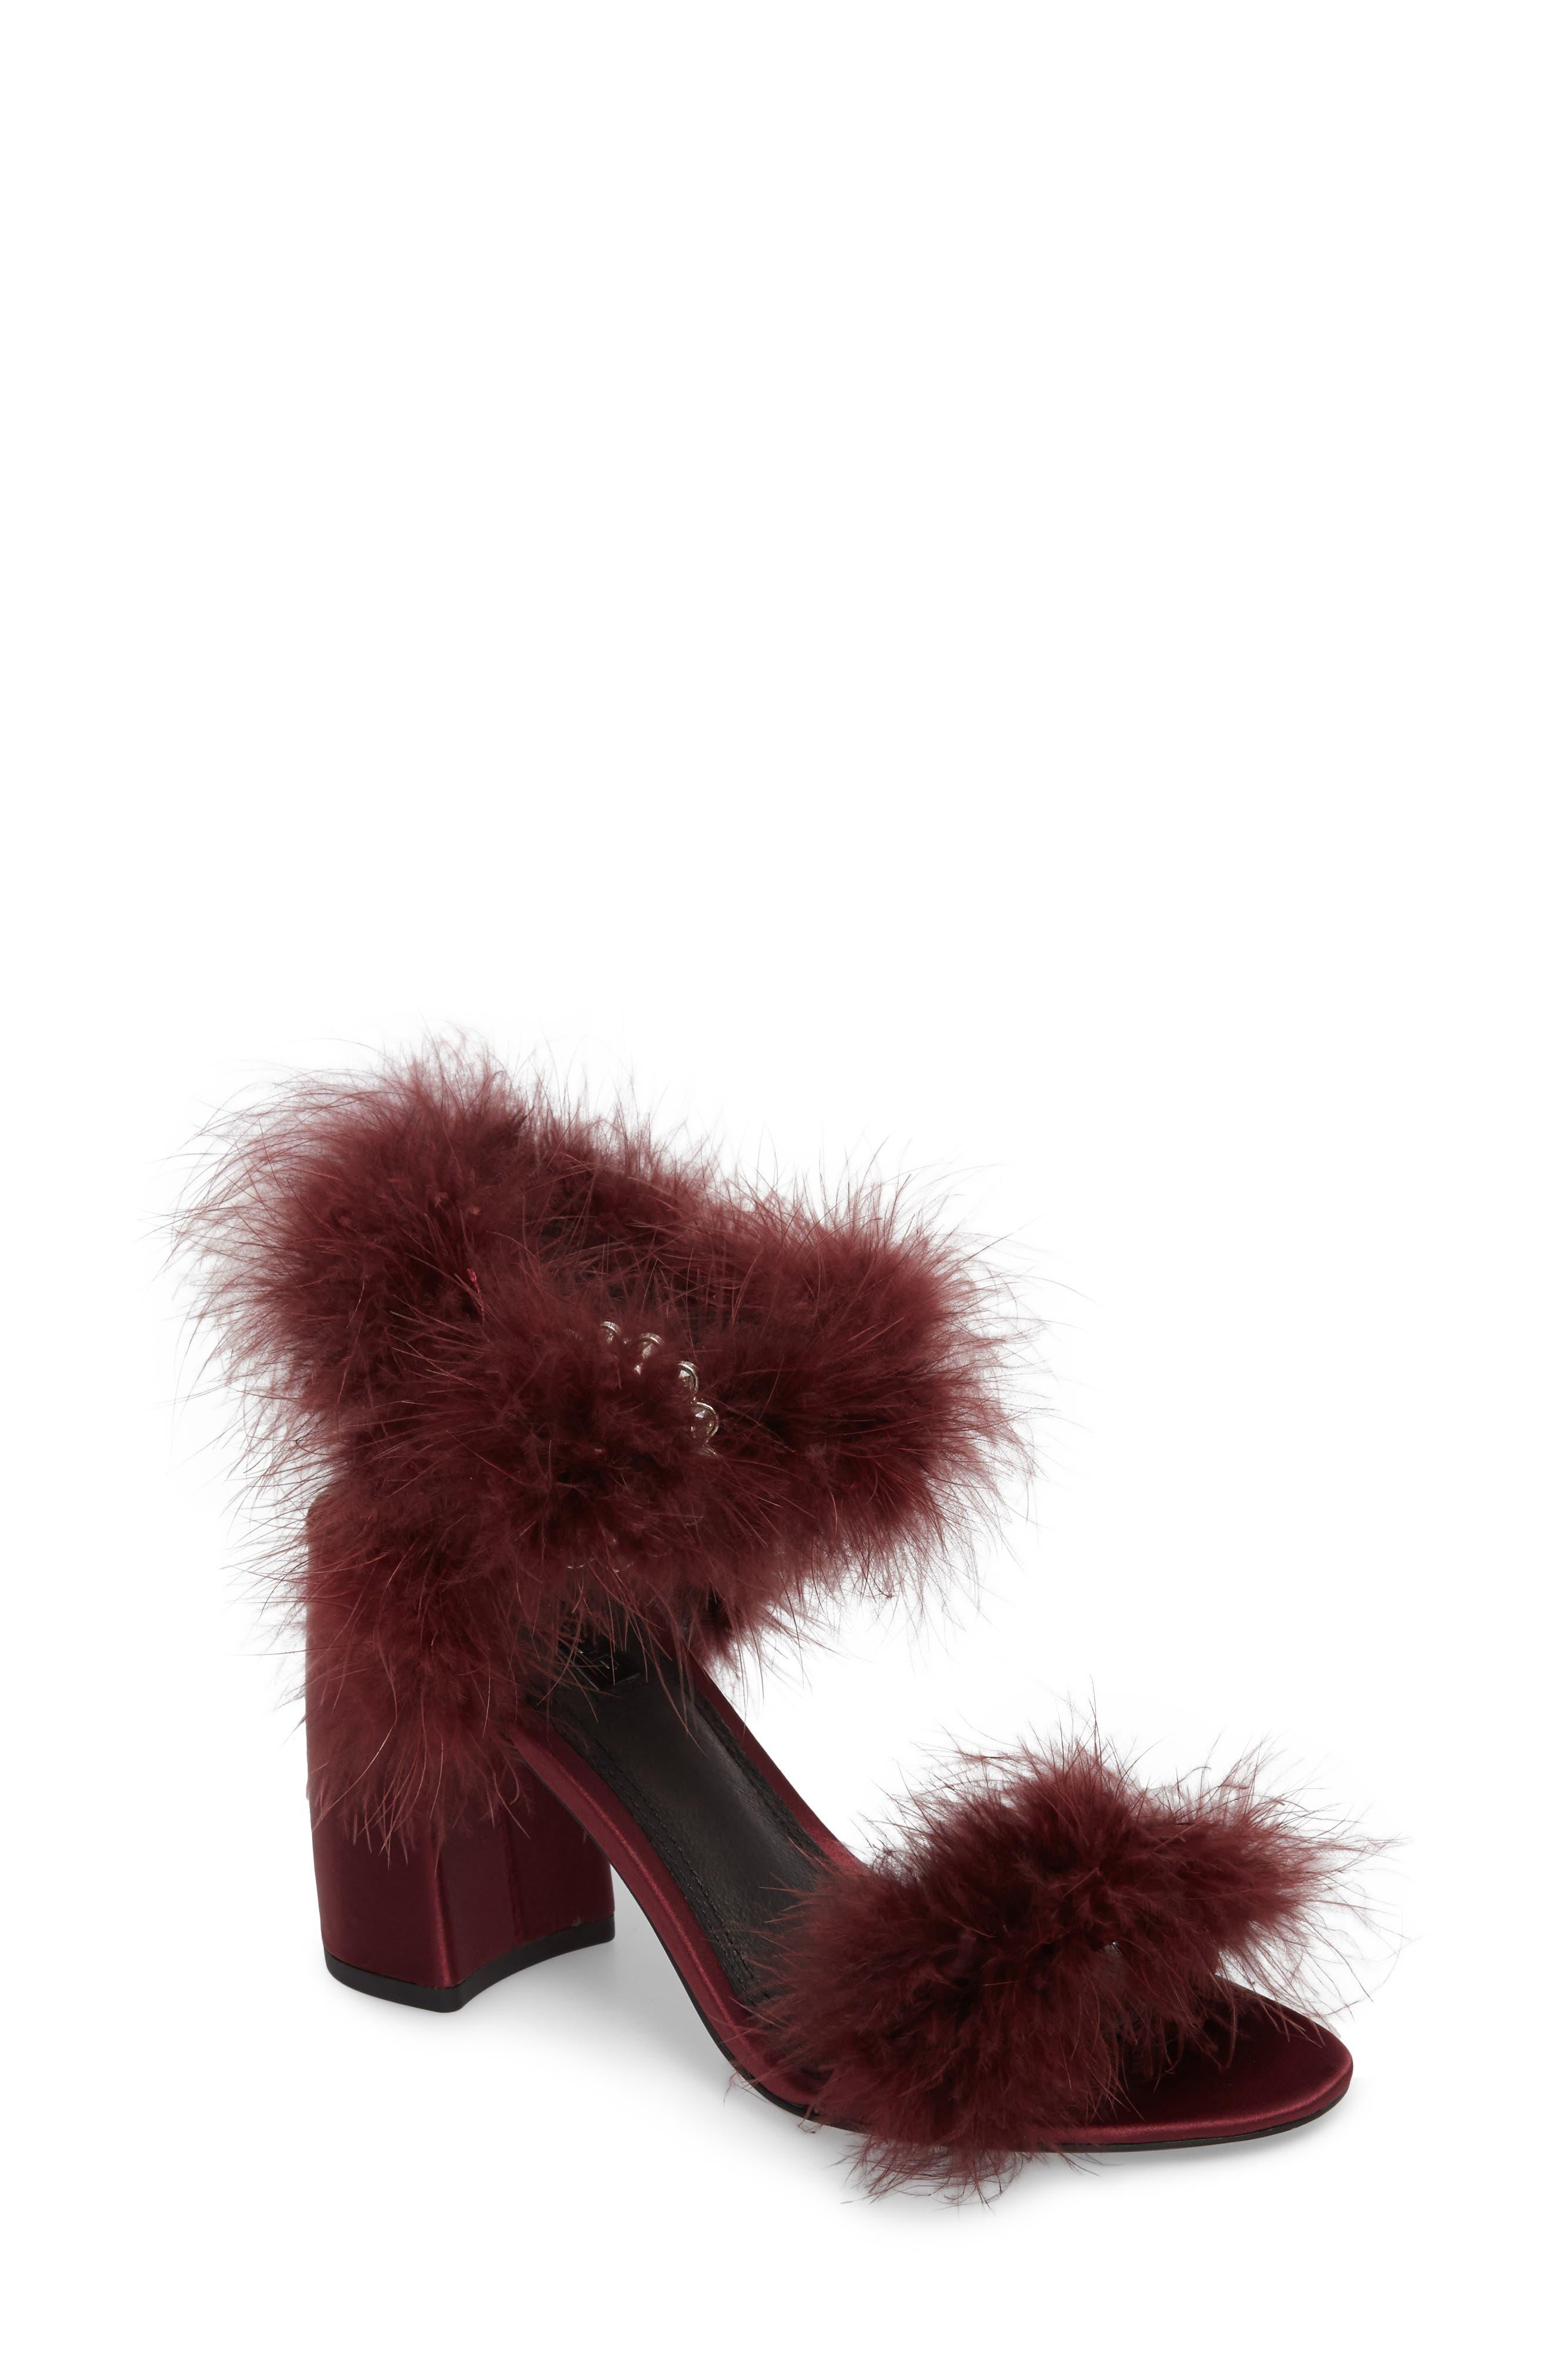 Maribou Feather Sandal,                         Main,                         color, 930